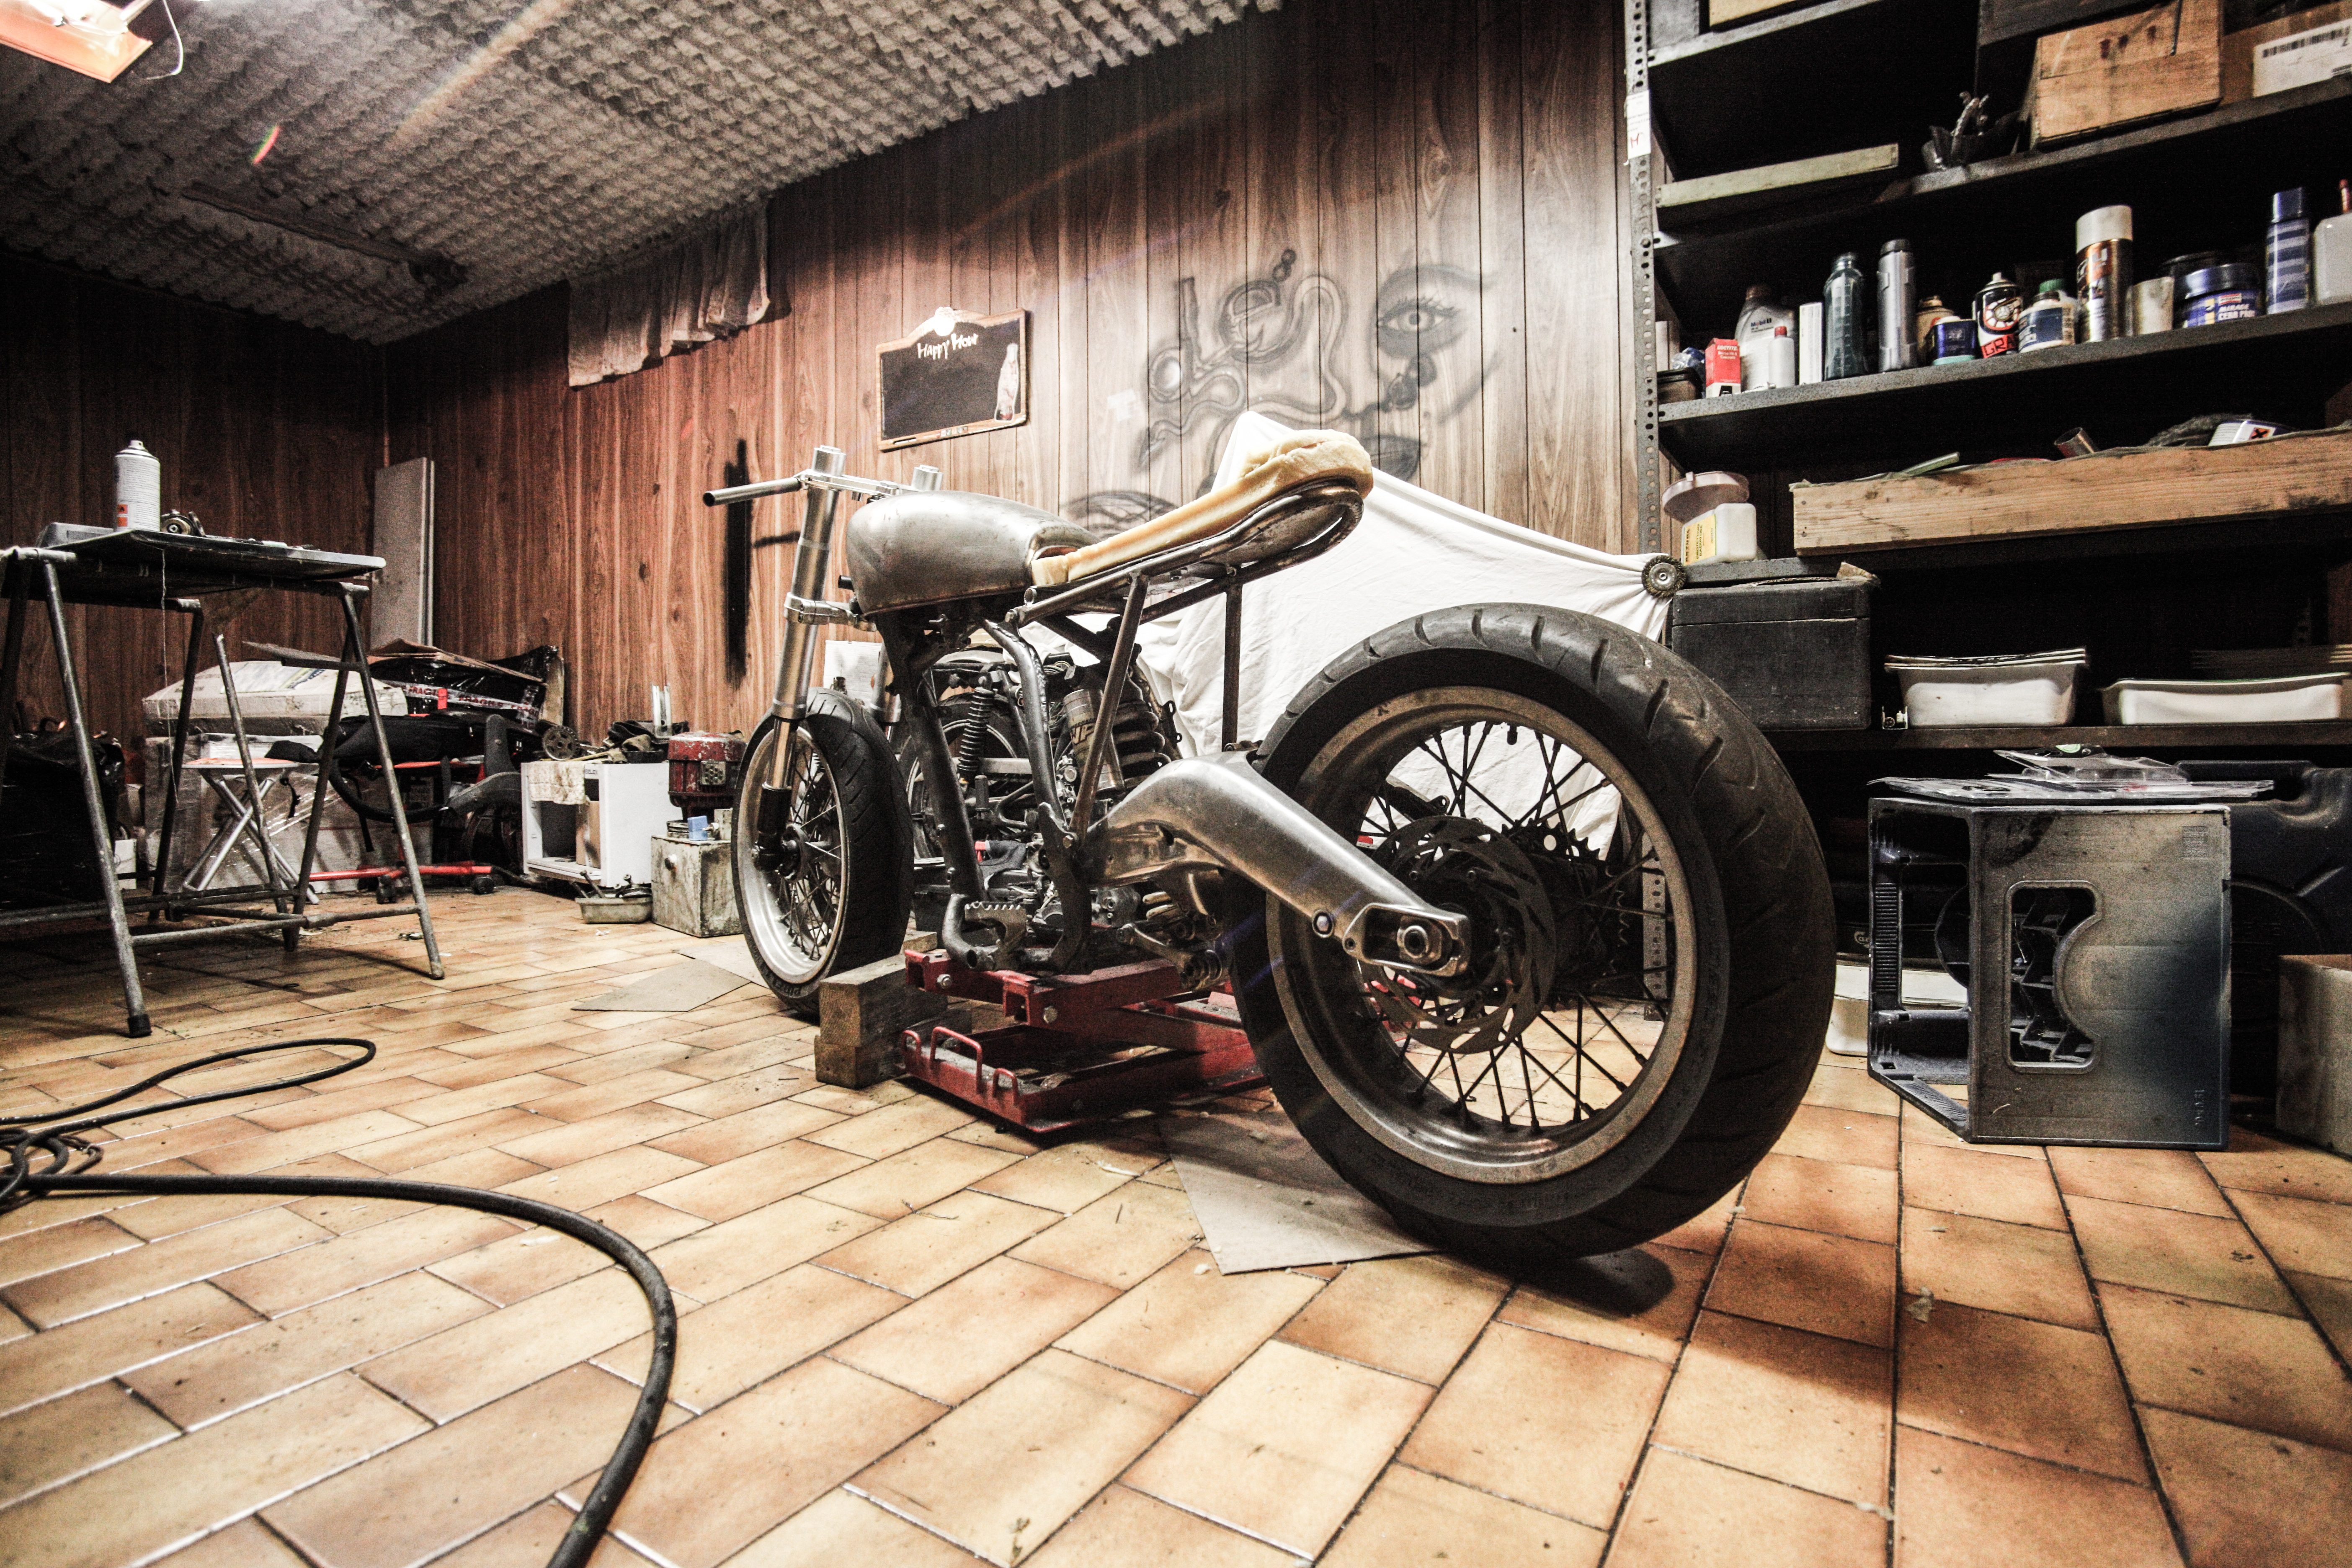 motorbike-407186